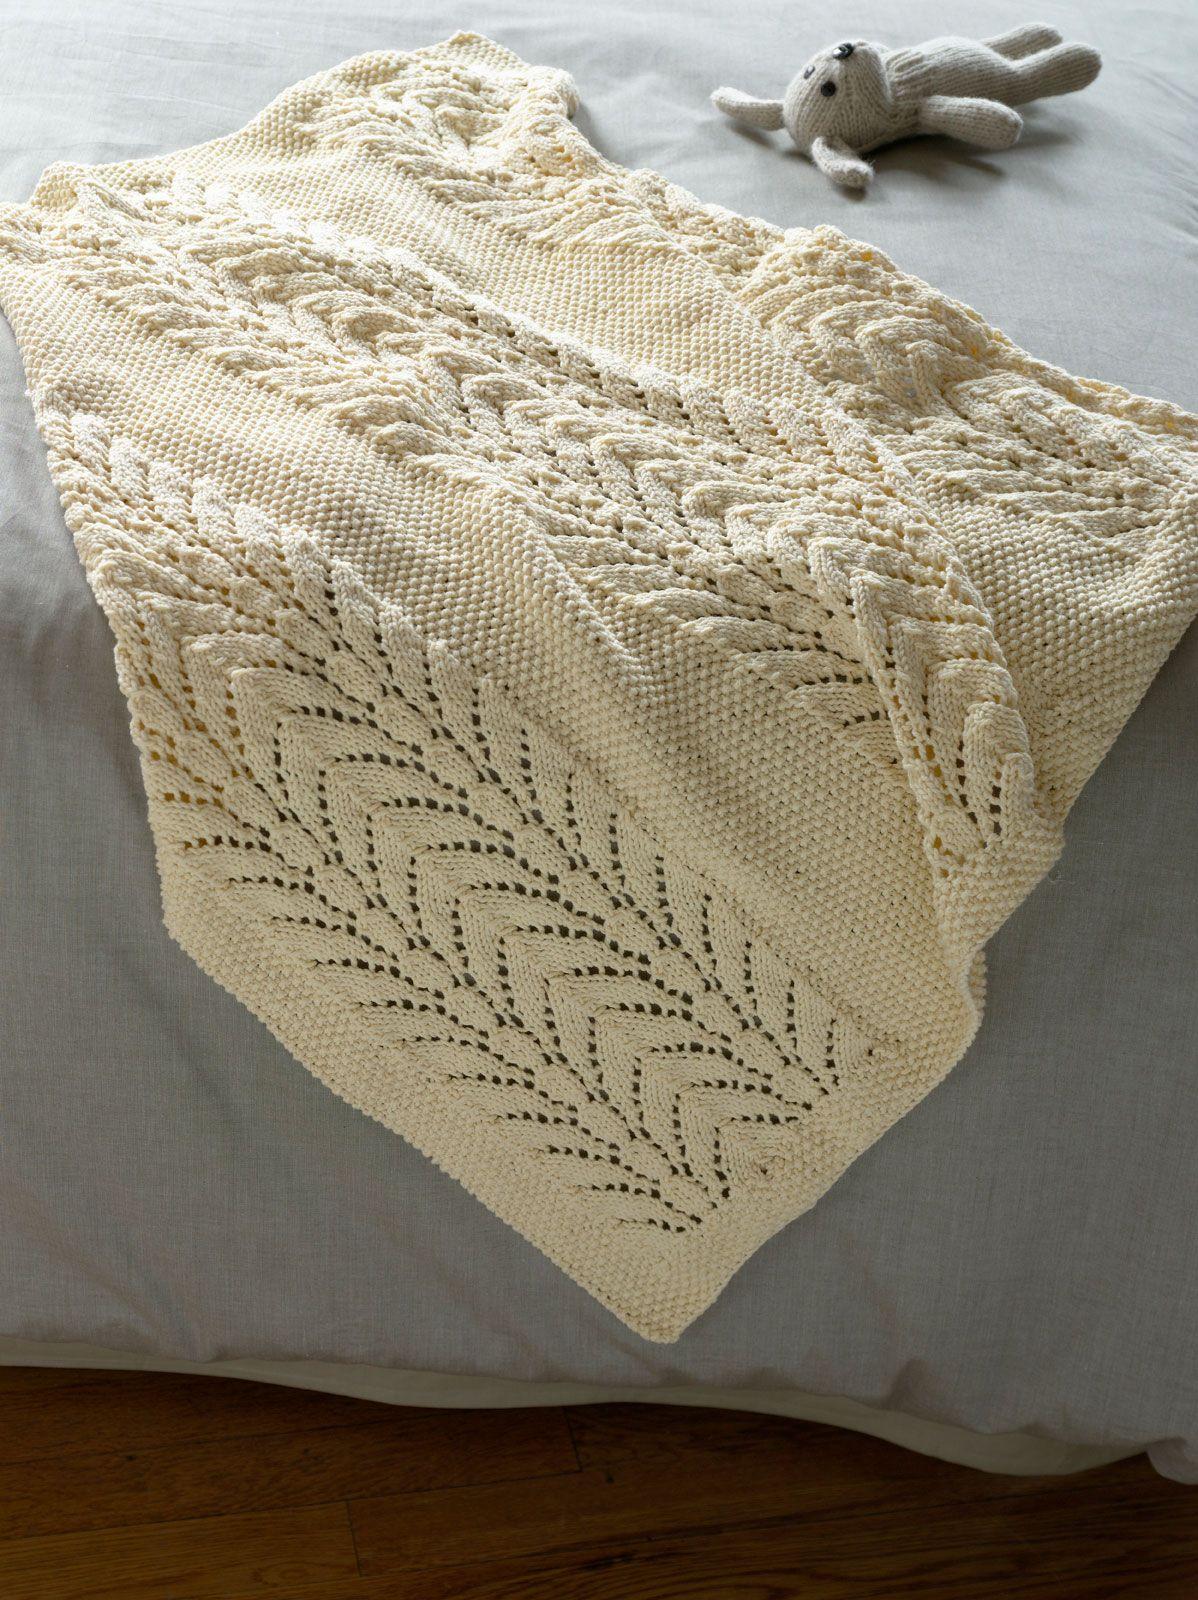 Lace knit baby blanket - Free pattern via Lion Brand Yarn | Knitting ...